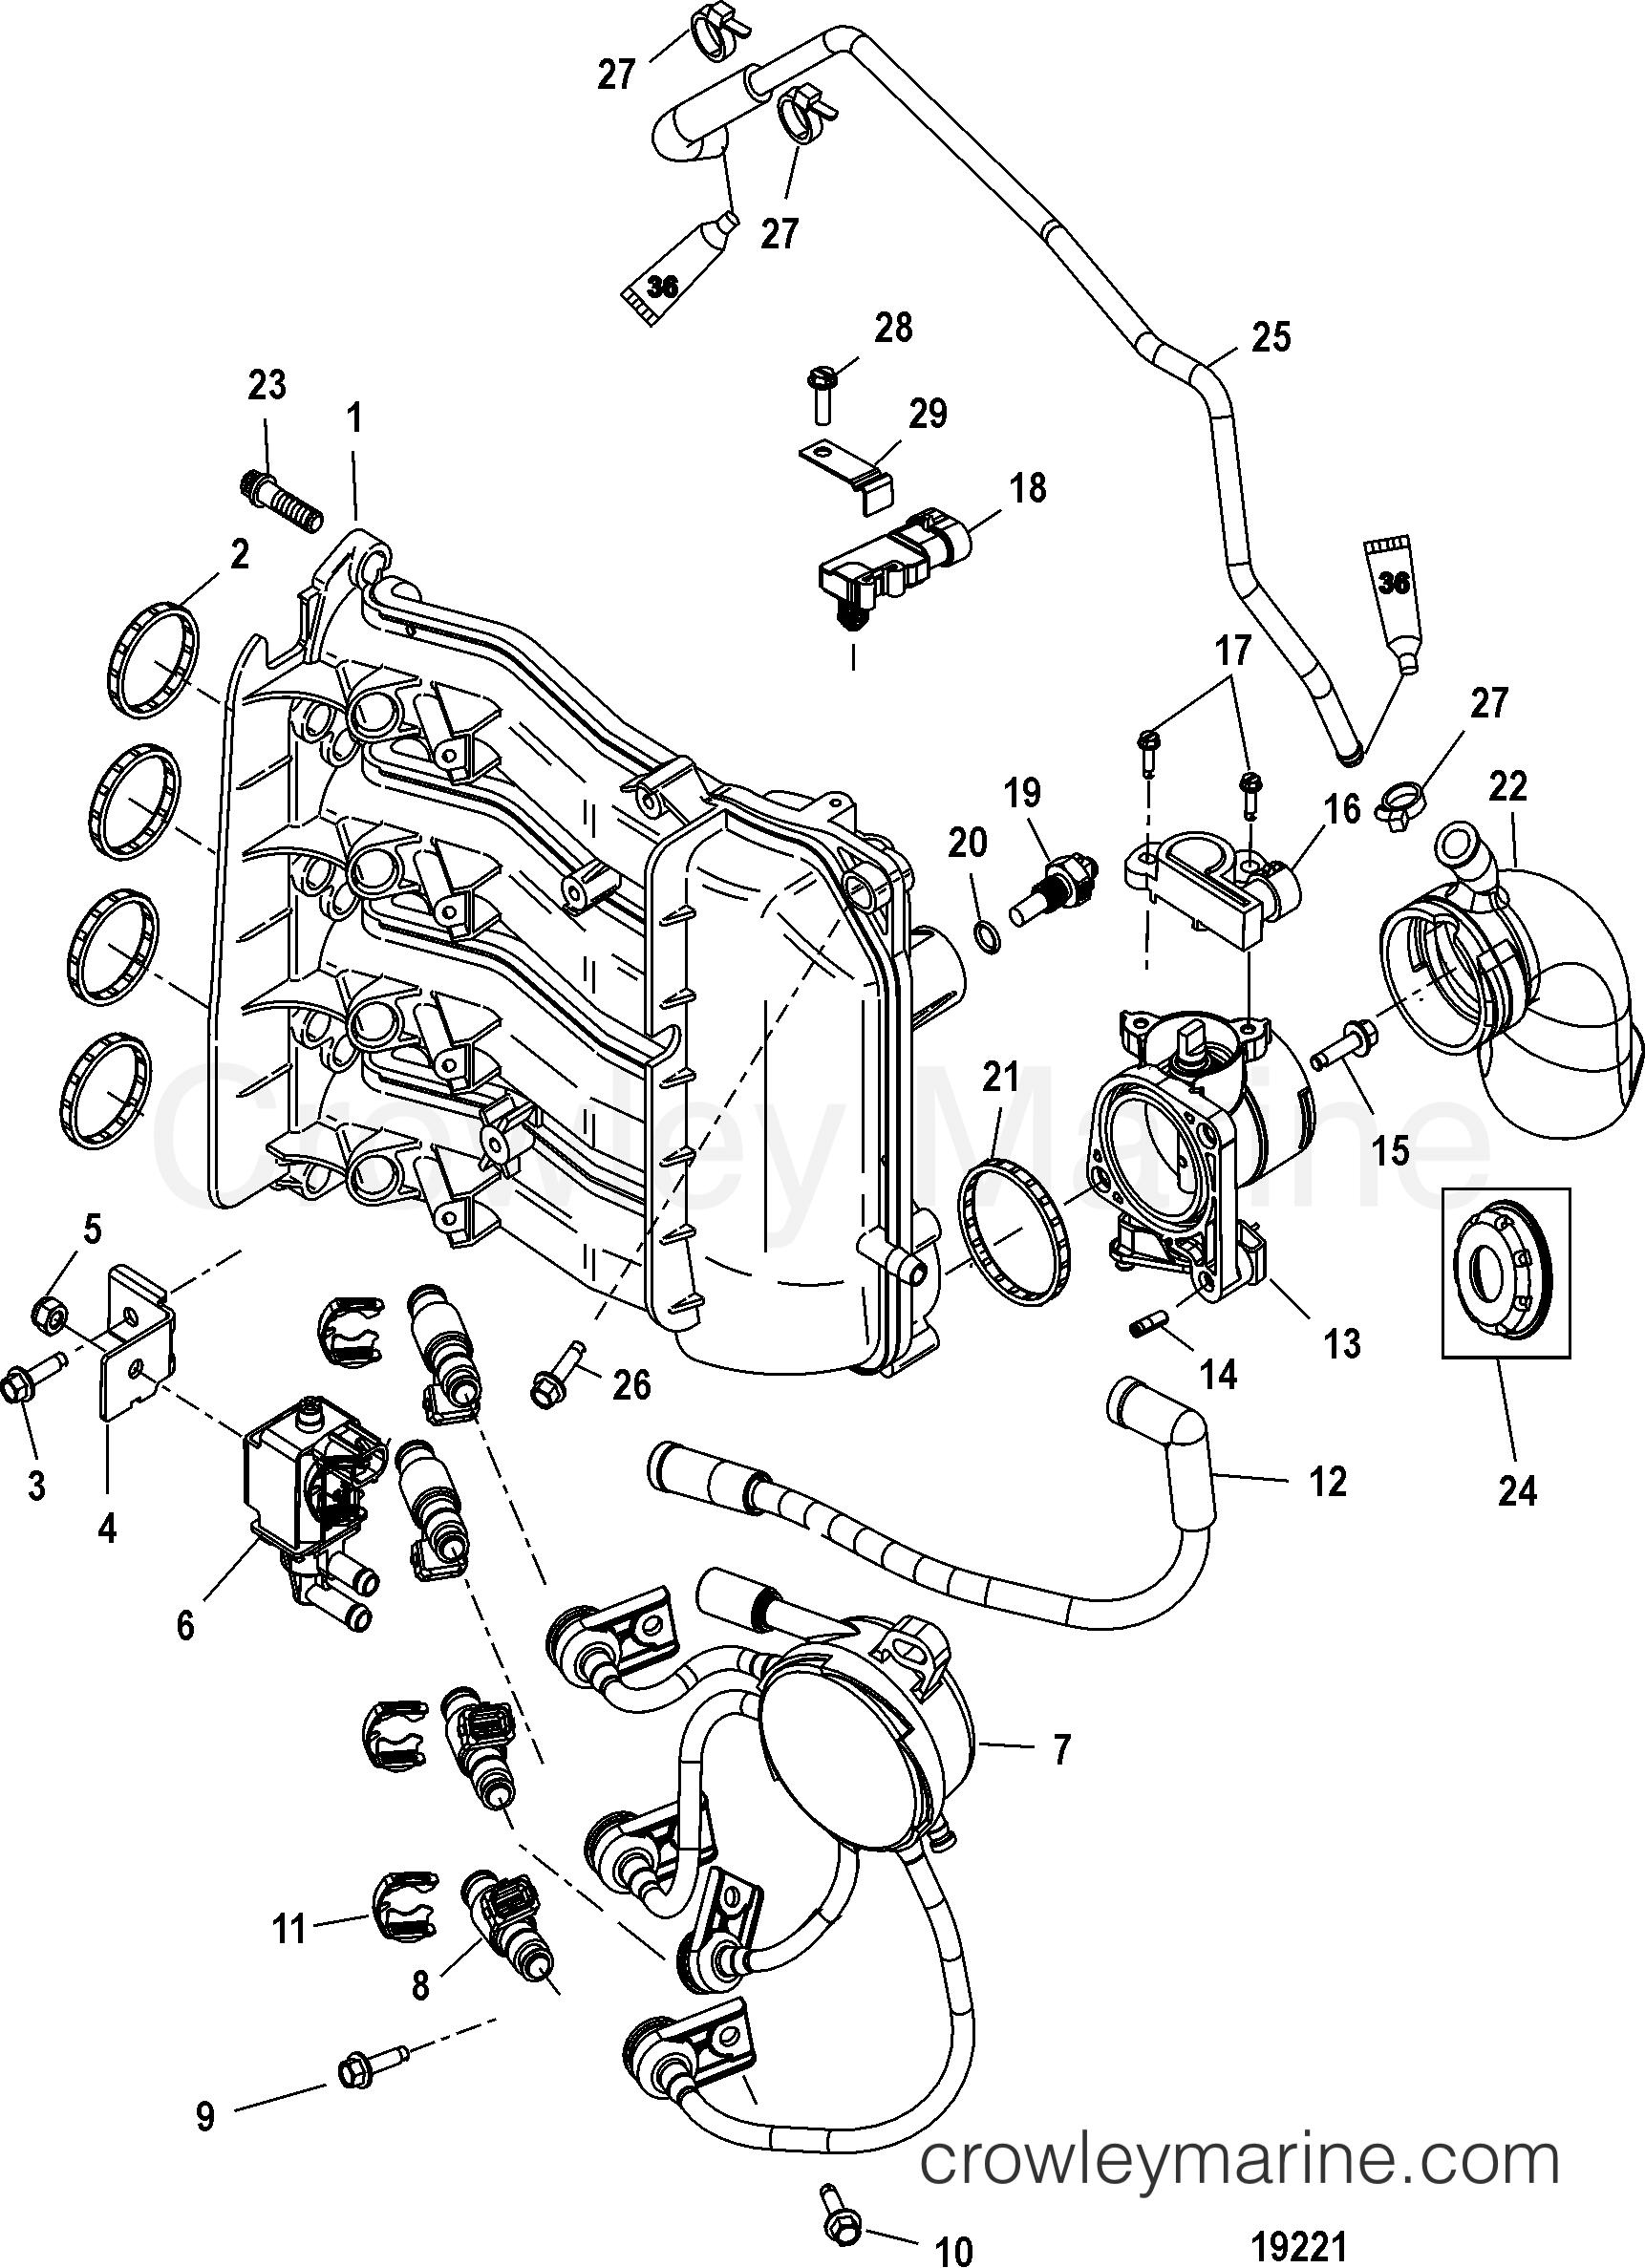 2006 Mercury Outboard 50EFI [ELPT/BF 4] - 1E51452FB - INTAKE MANIFOLD section